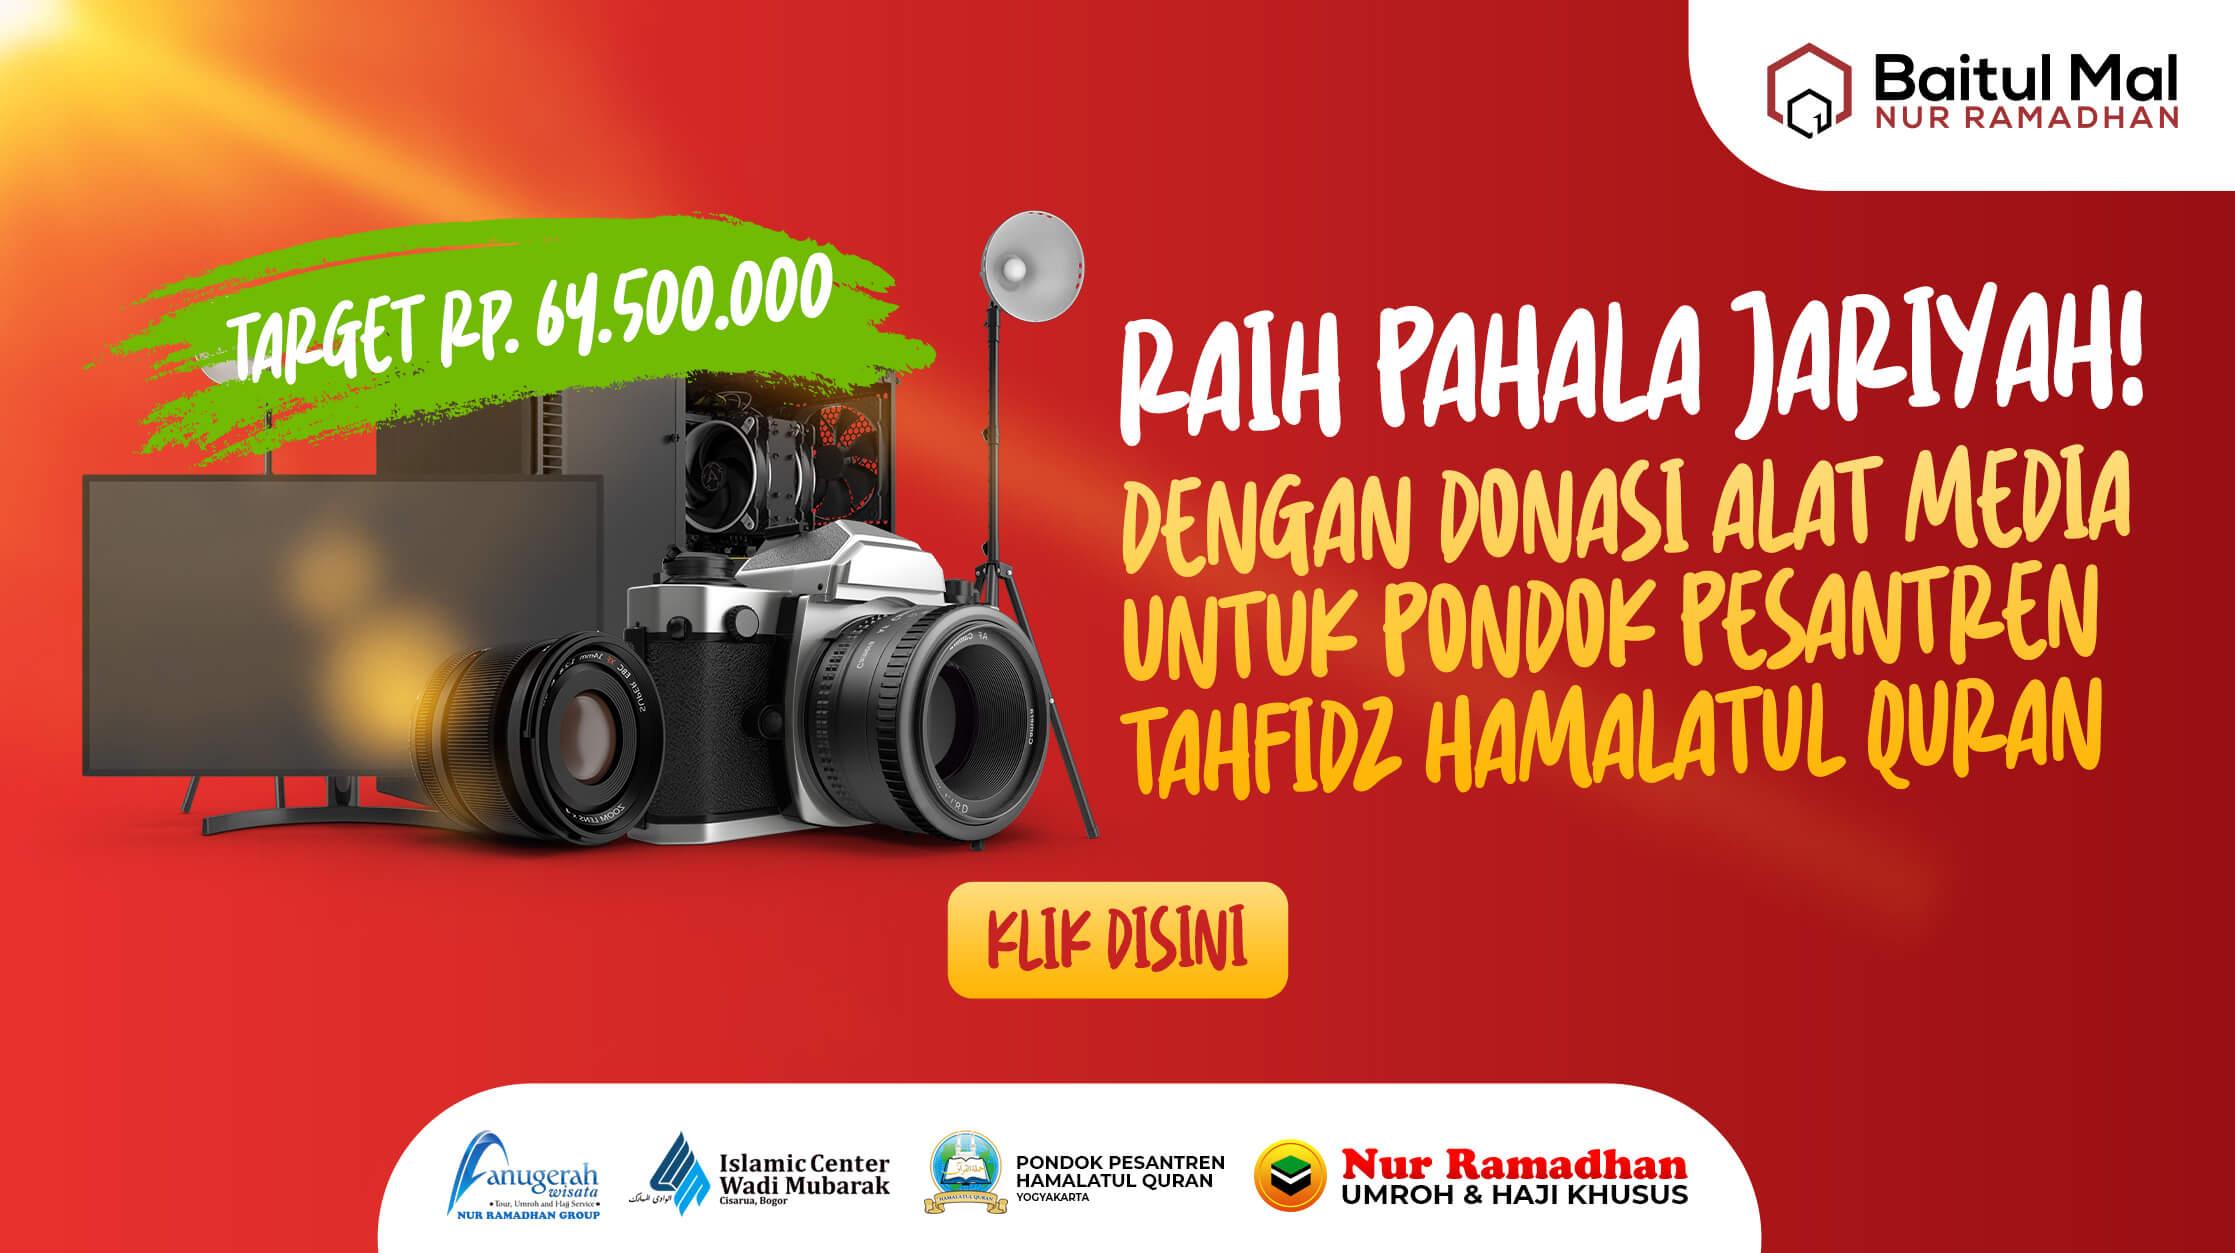 Donasi Perangkat Multi Media, Baitul Mal Nur Ramadhan